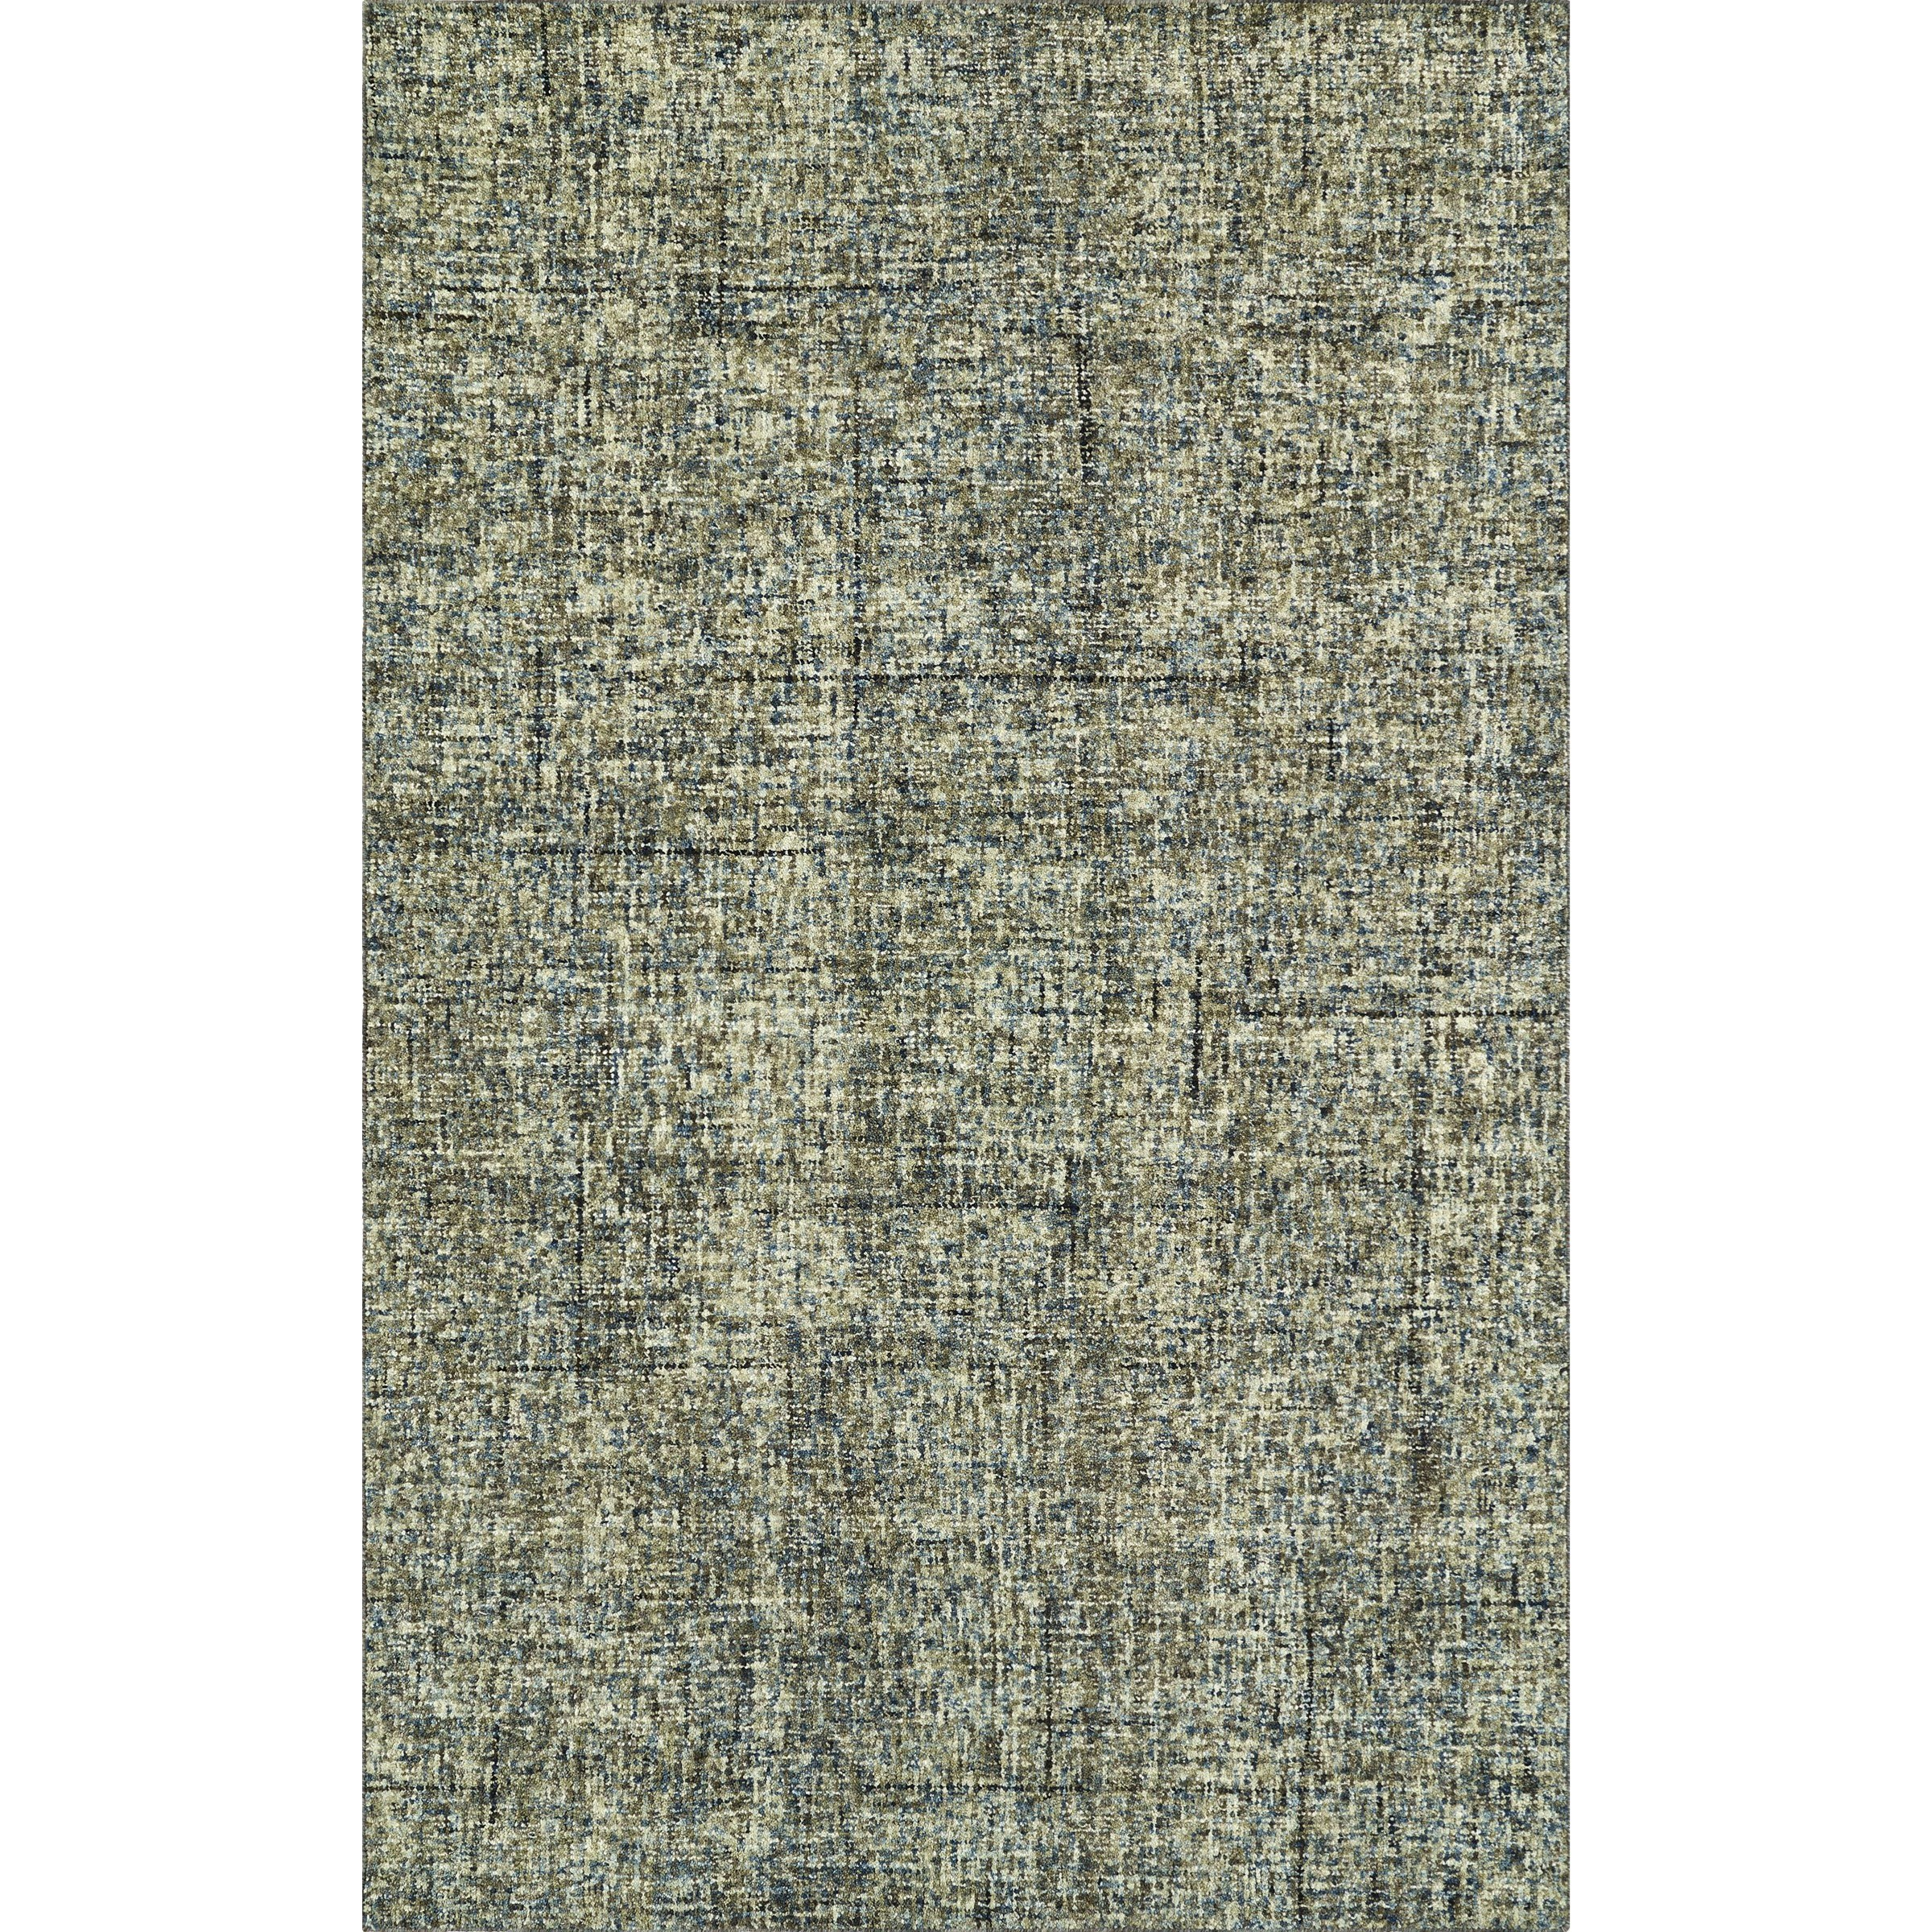 Calisa Indigo 9'X13' Rug by Dalyn at Arwood's Furniture